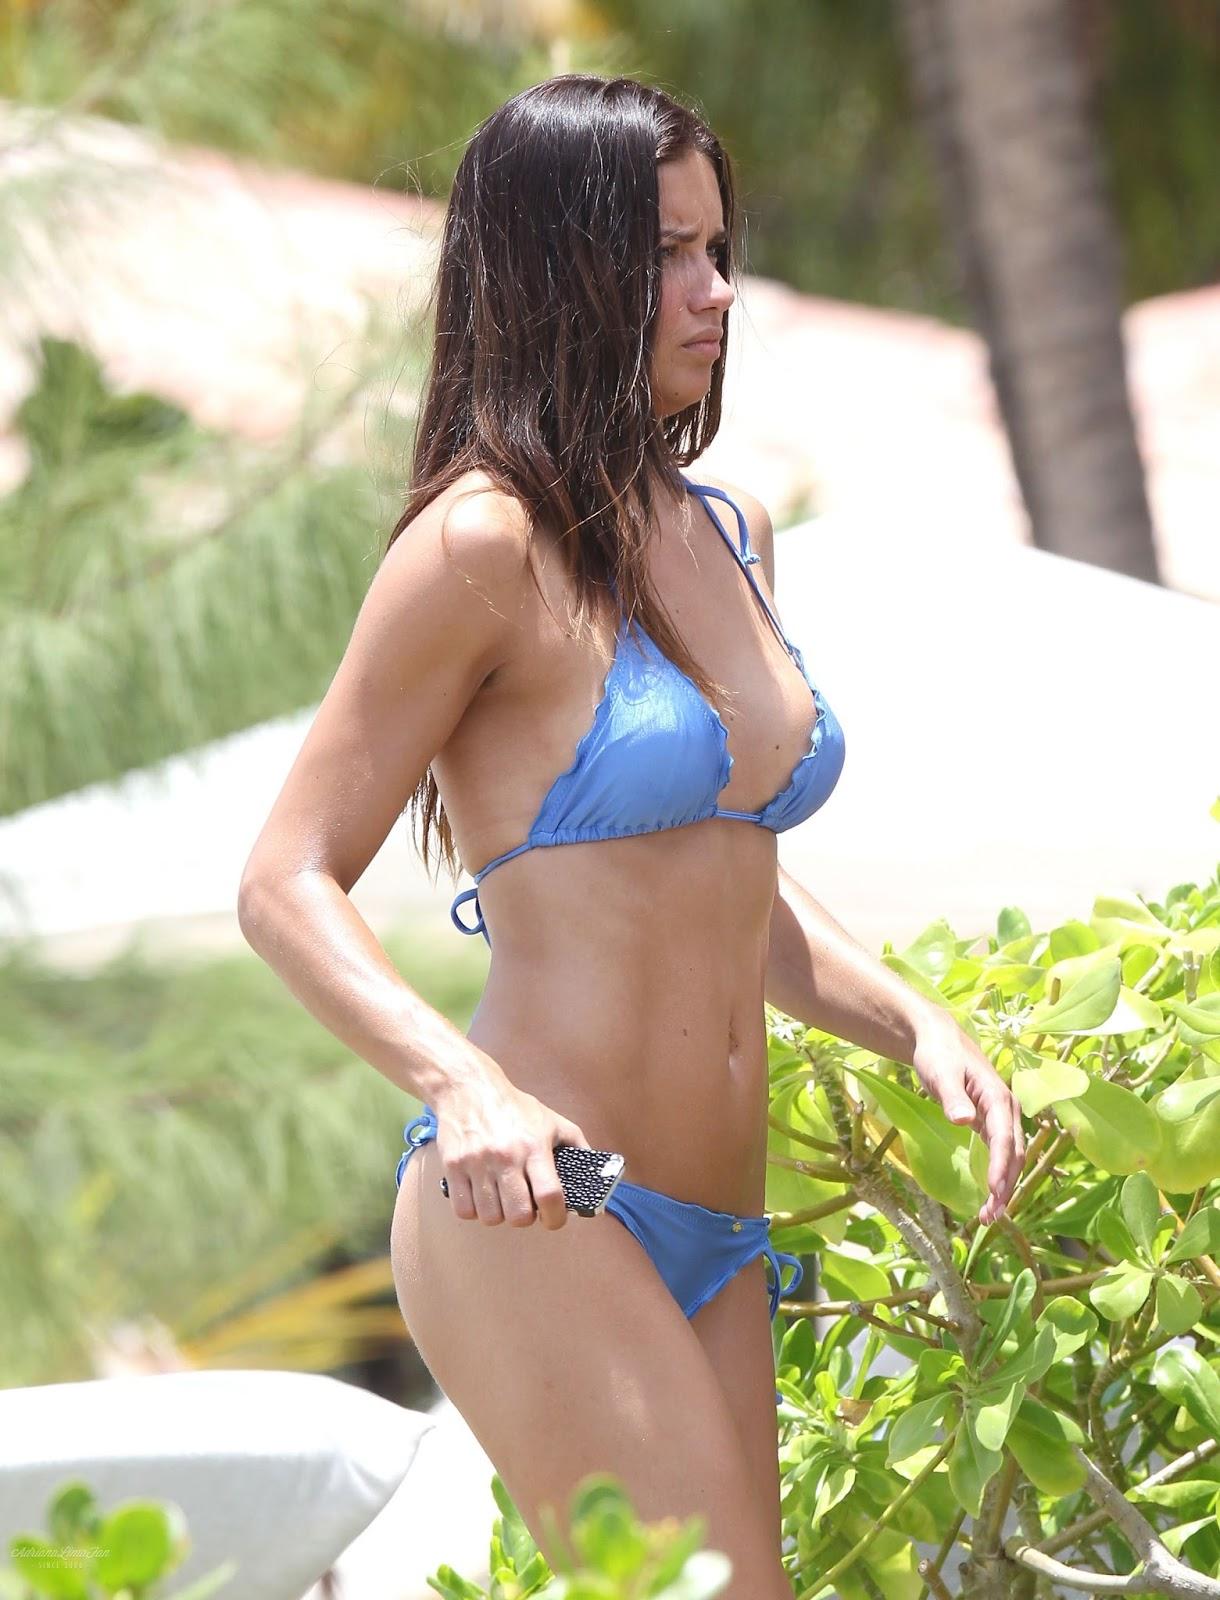 Lezetblog: Adriana Lima Shows Off Her Bikini Body During A ...